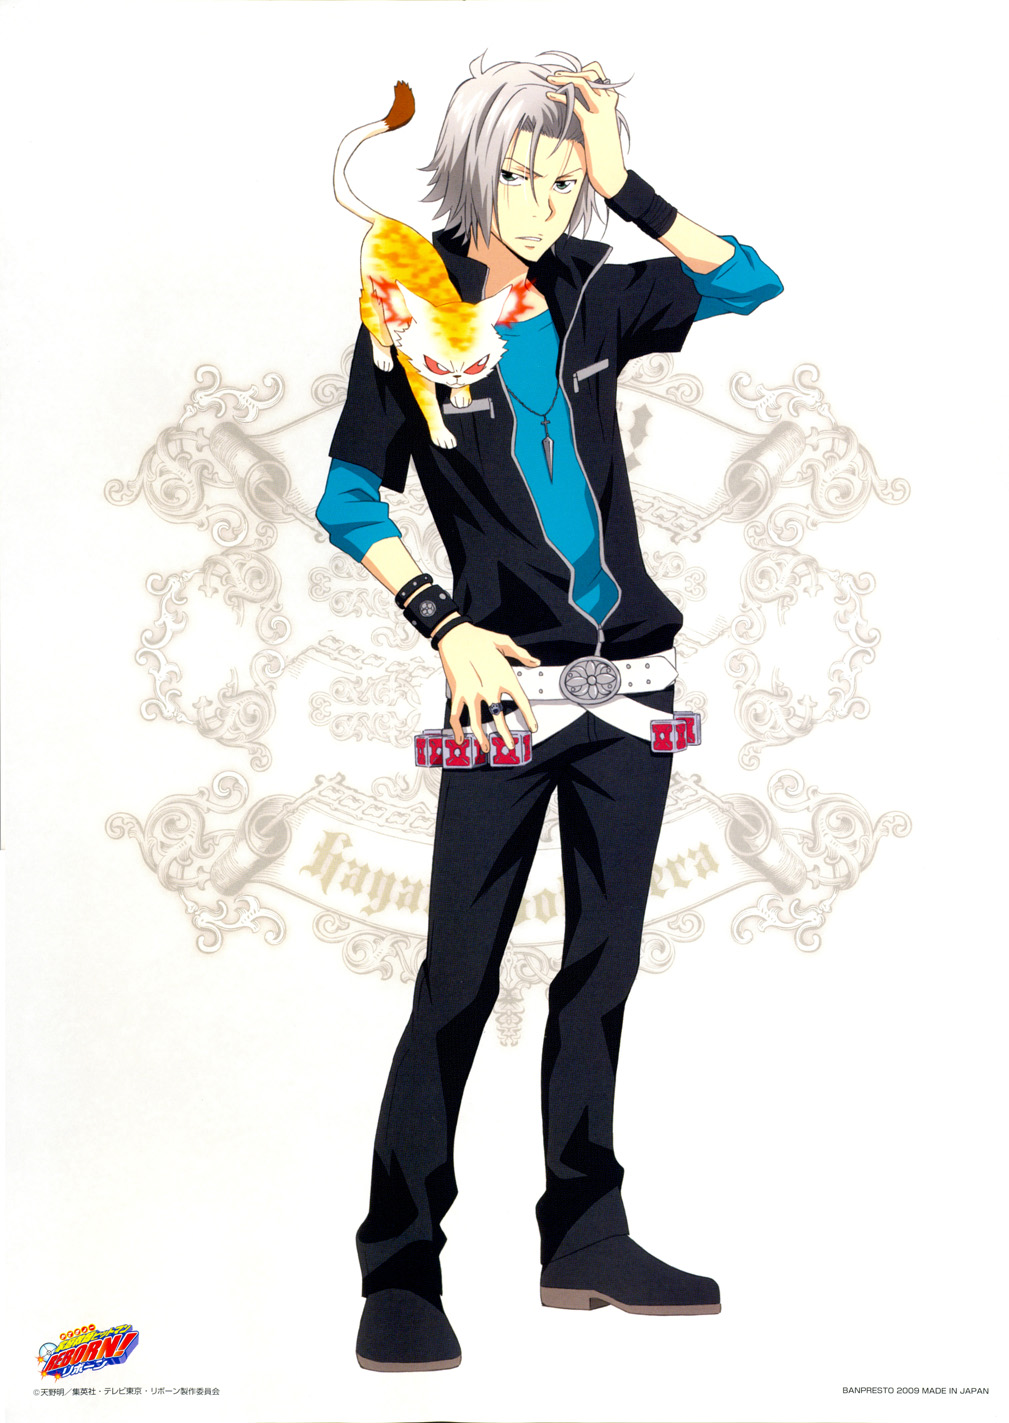 Gokudera Hayato/#349721 - Zerochan Katekyo Hitman Reborn Uri